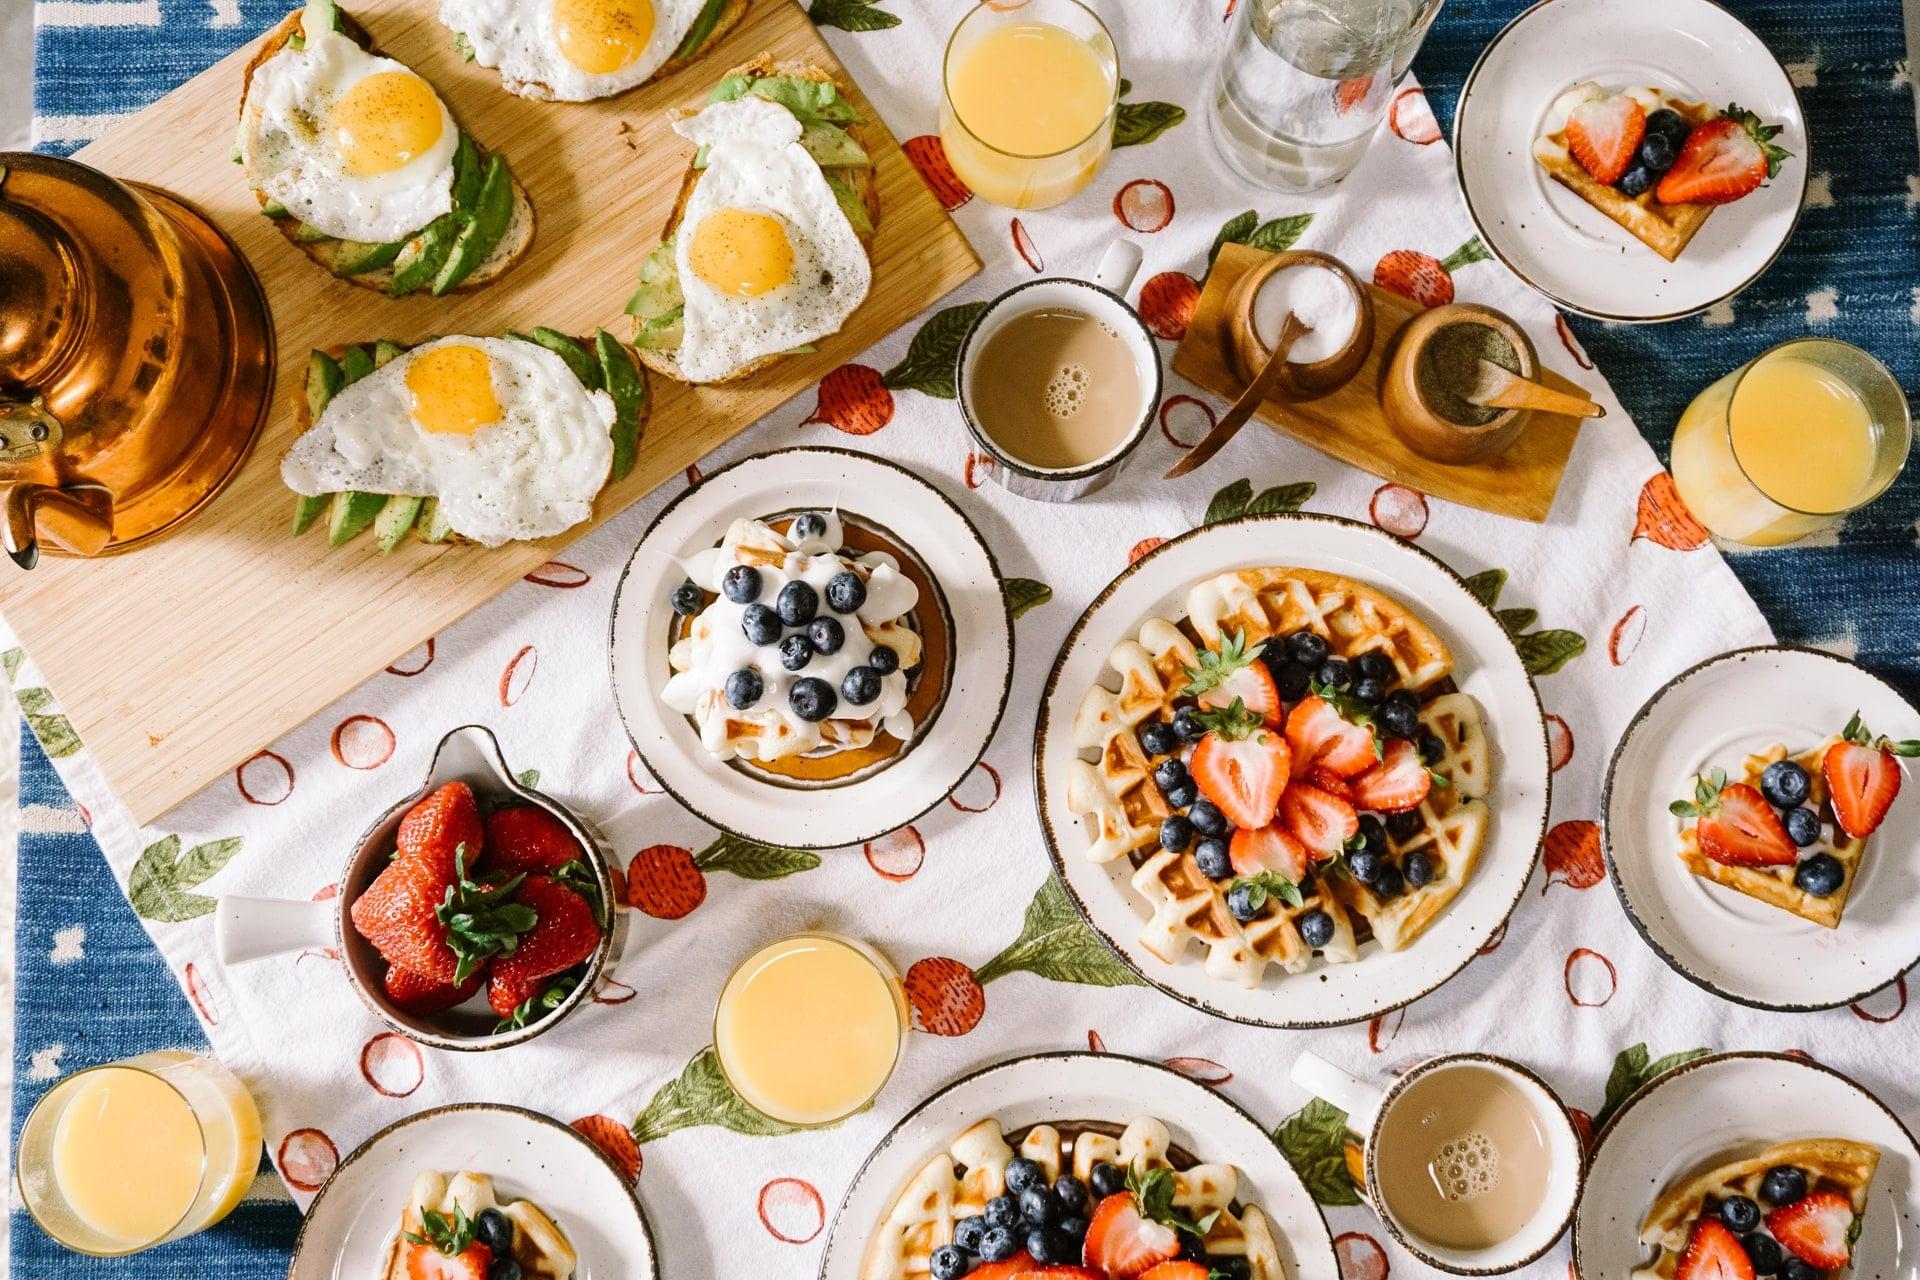 Read more about the article מה הקשר בין ערוצי שיווק לארוחת בוקר?